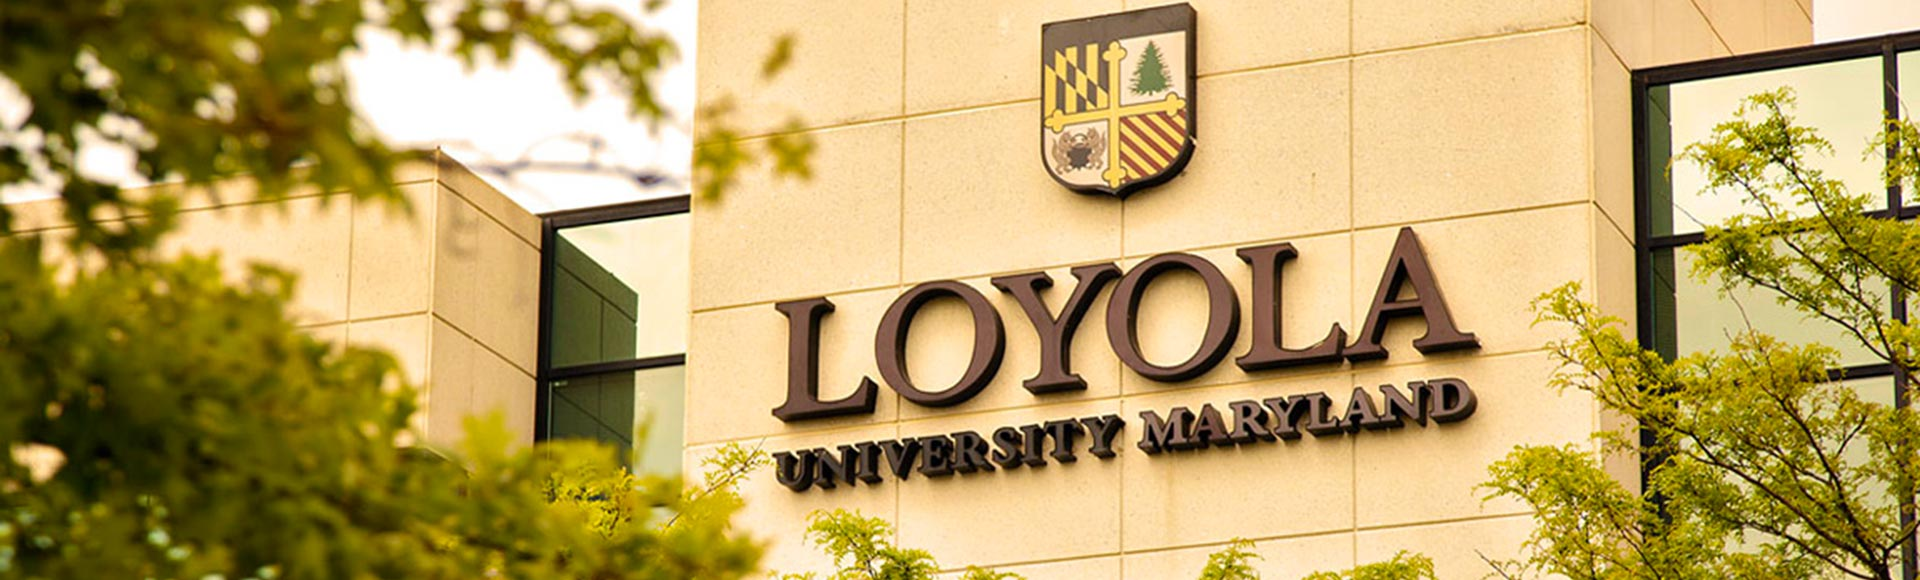 columbia-md-loyola-university-graduate-center.jpg